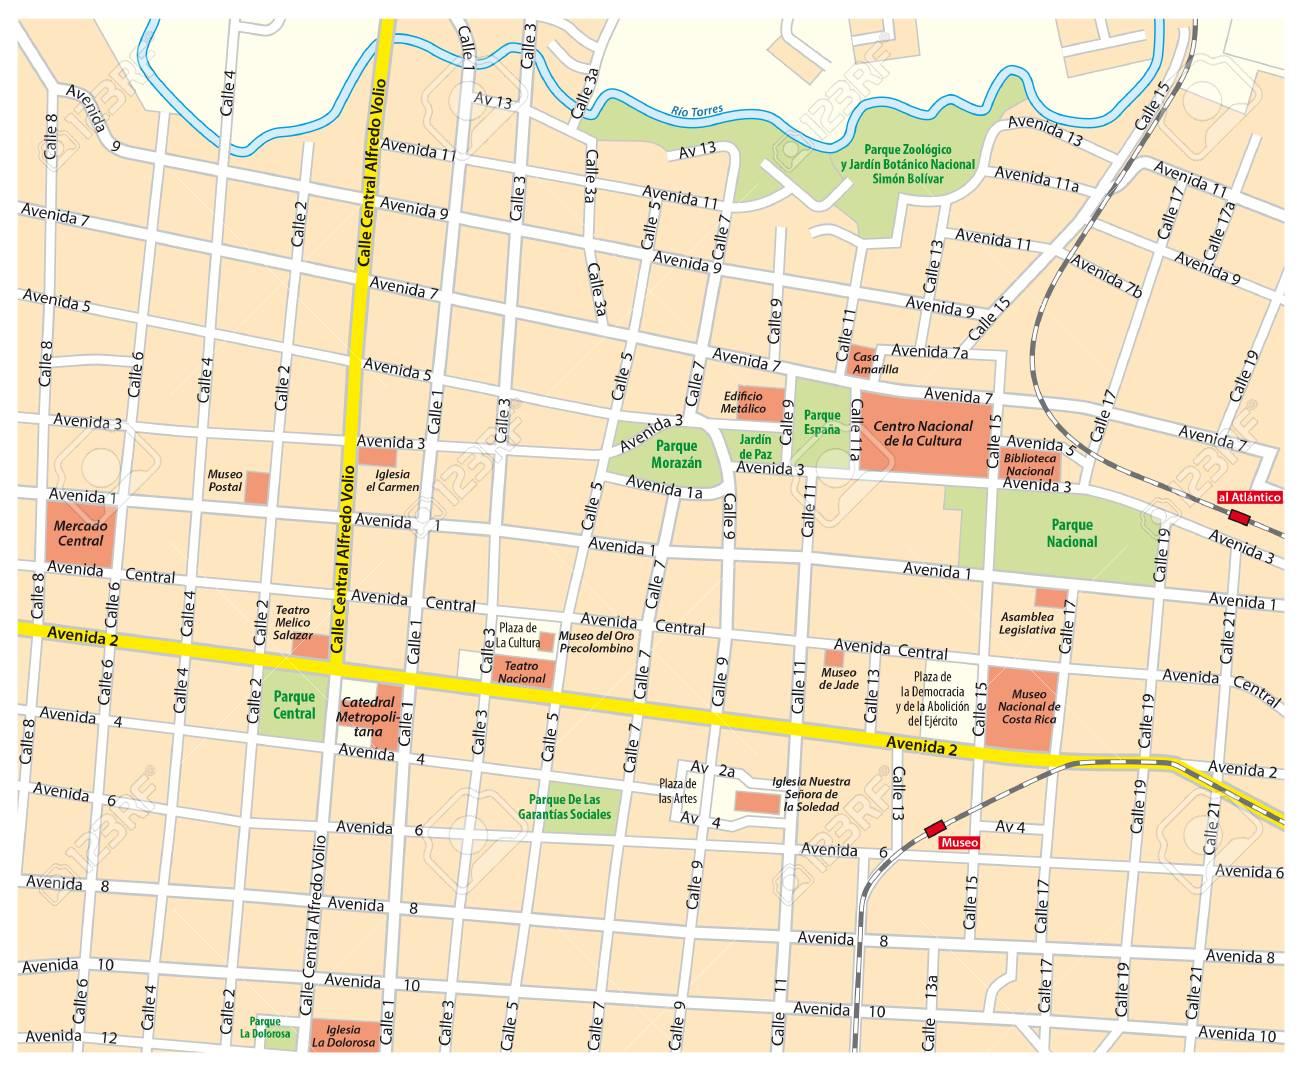 City map of downtown San Jose, Costa Rica